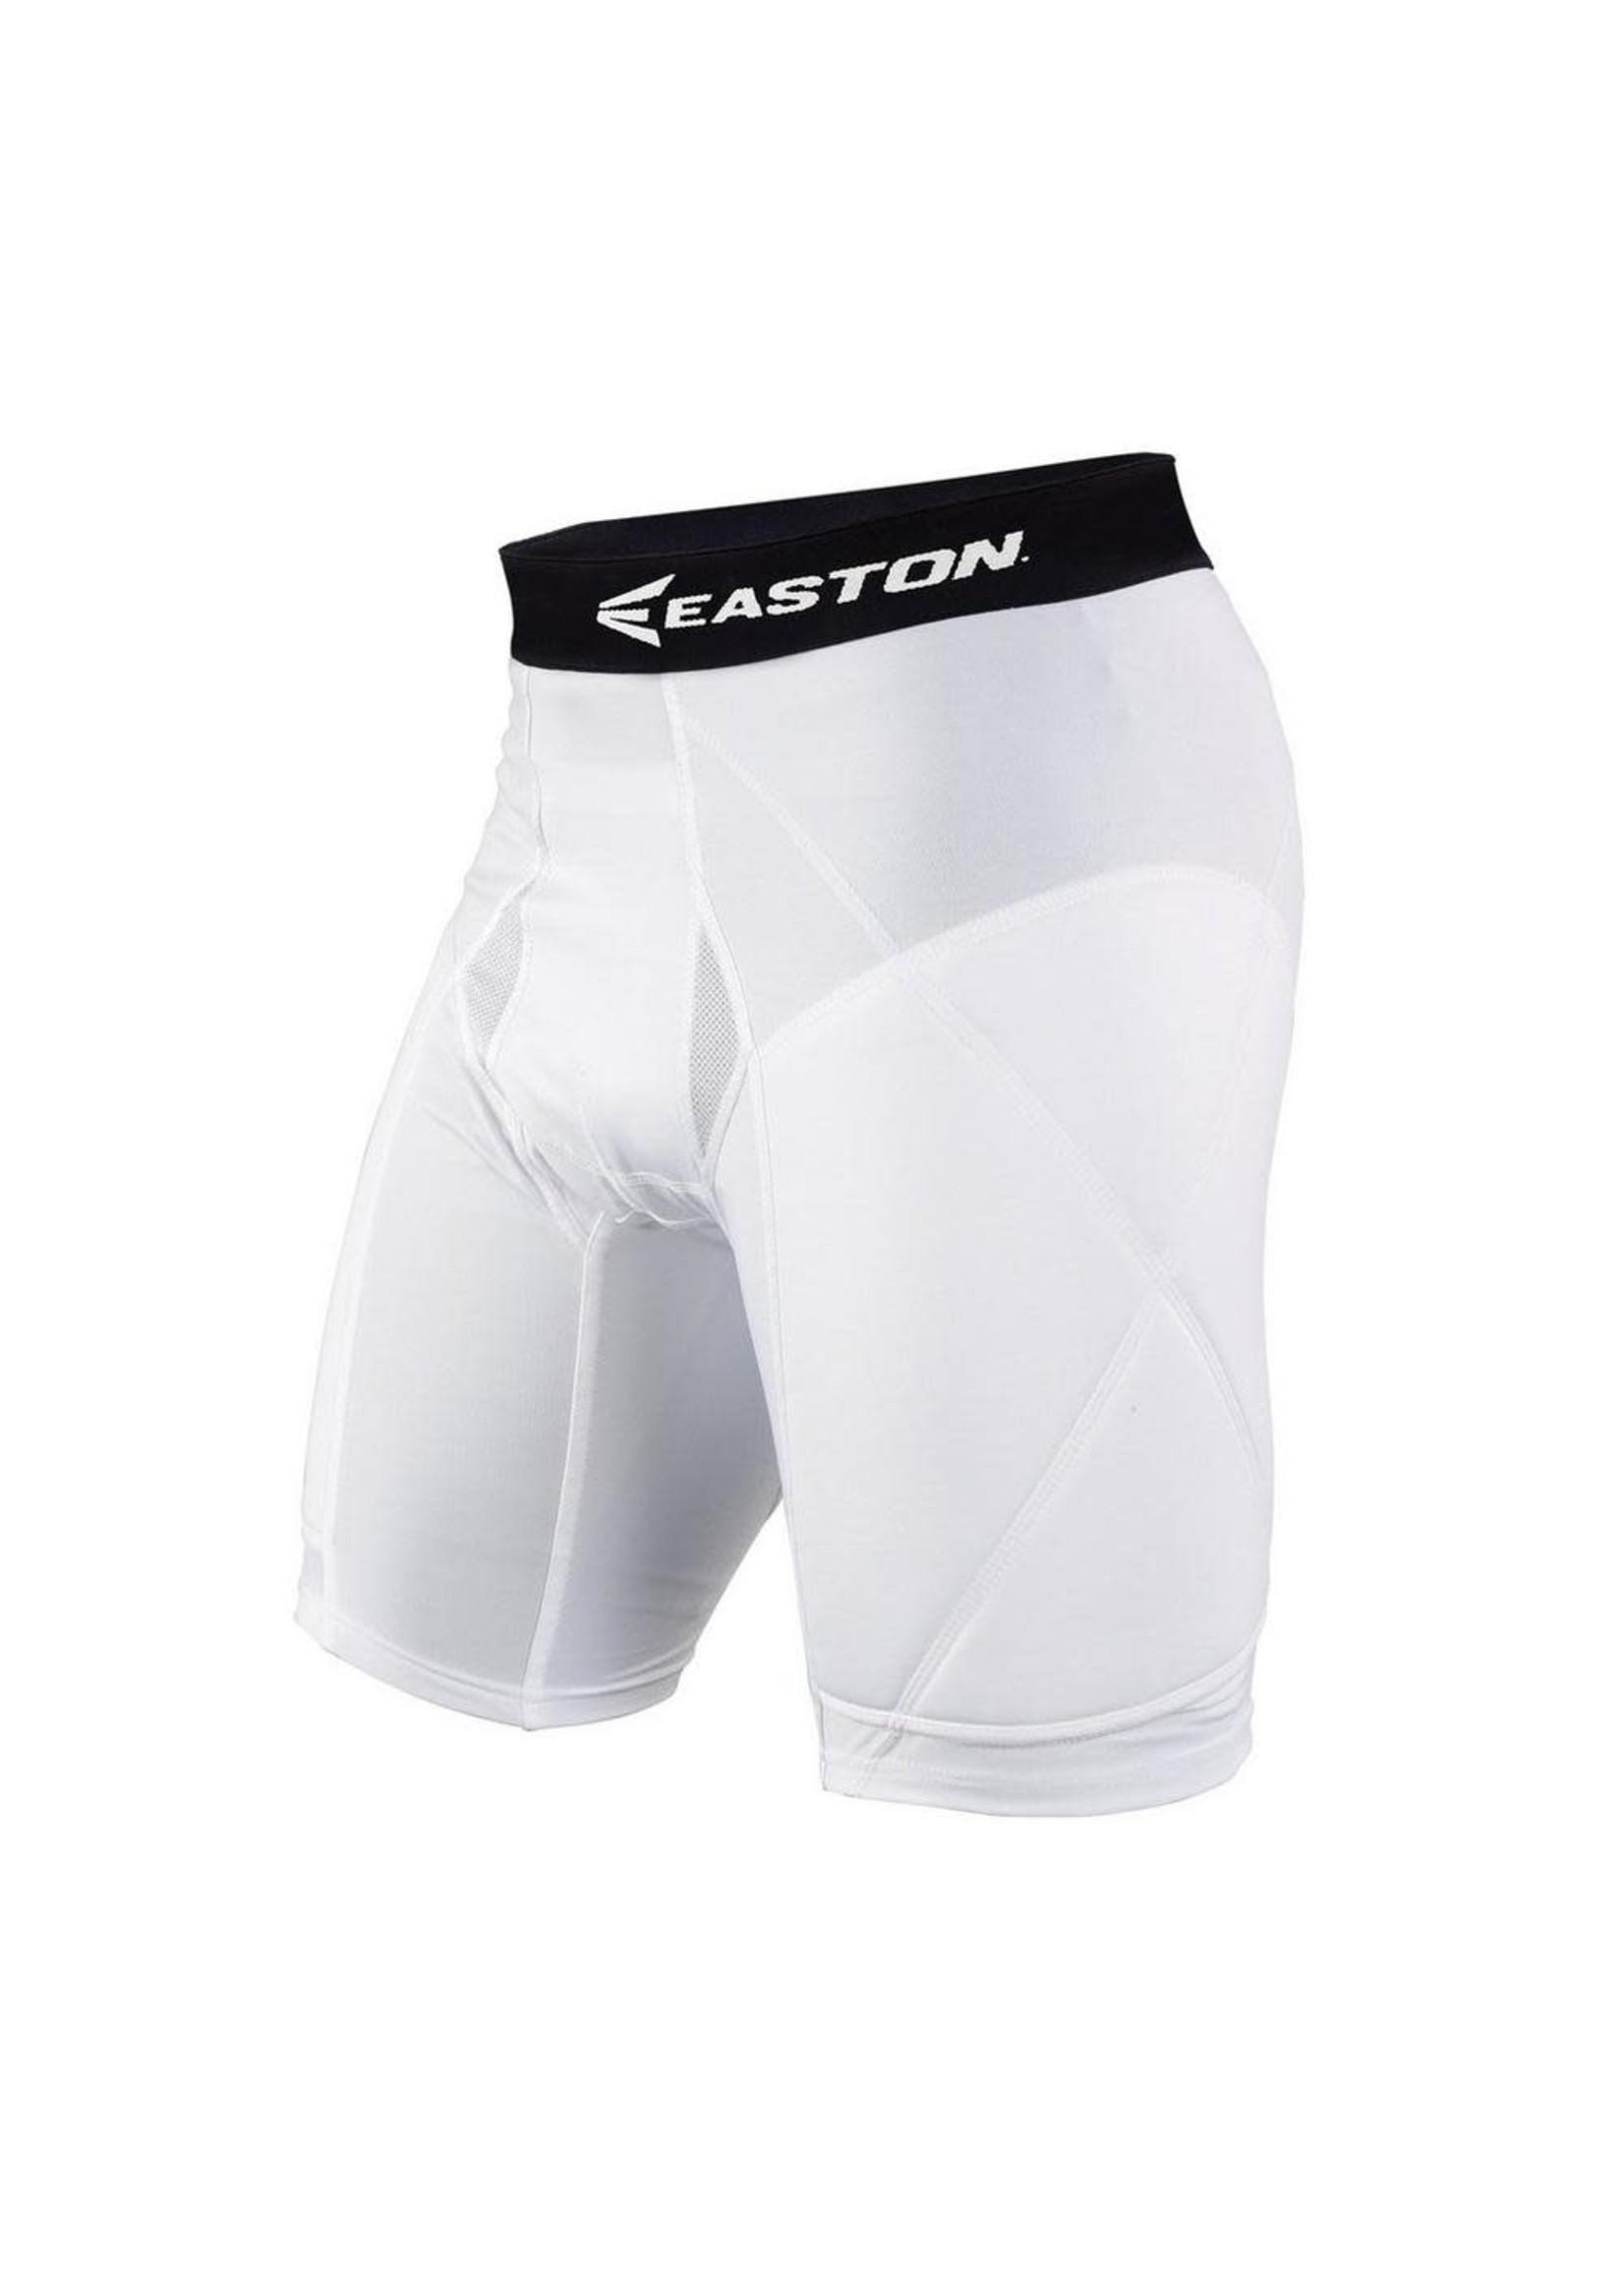 Easton Baseball (Canada) EASTON CULOTTE DE PROTECTION SPORTIVE ADULTE